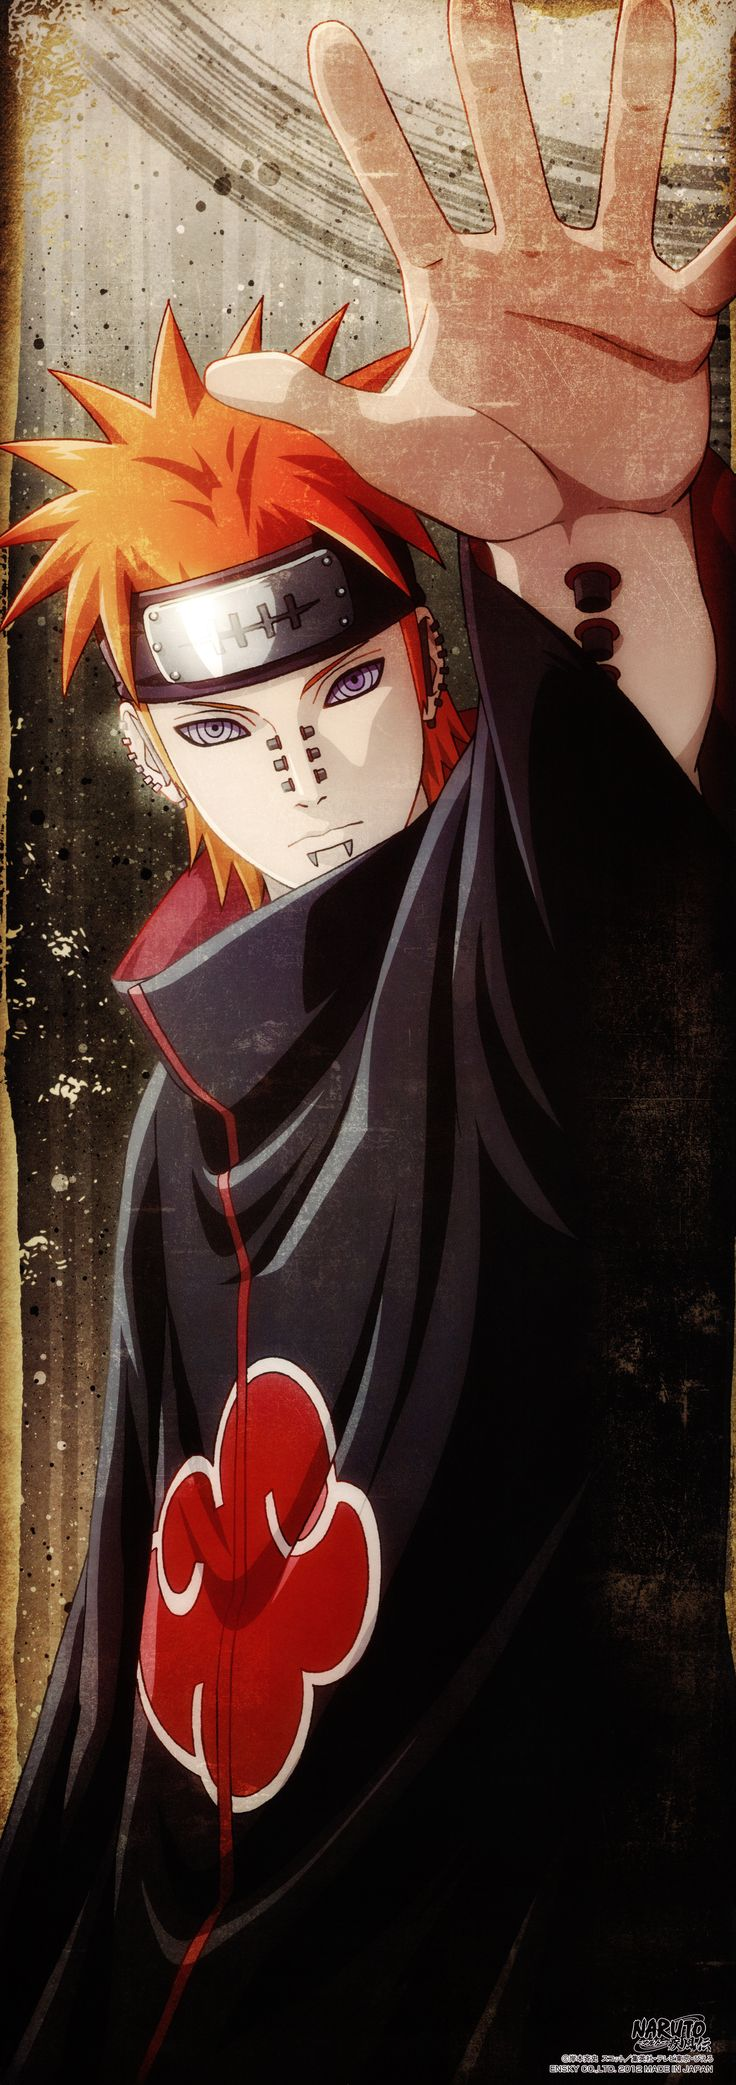 tags anime akatsuki naruto kishimoto masashi pein he killed jiriya